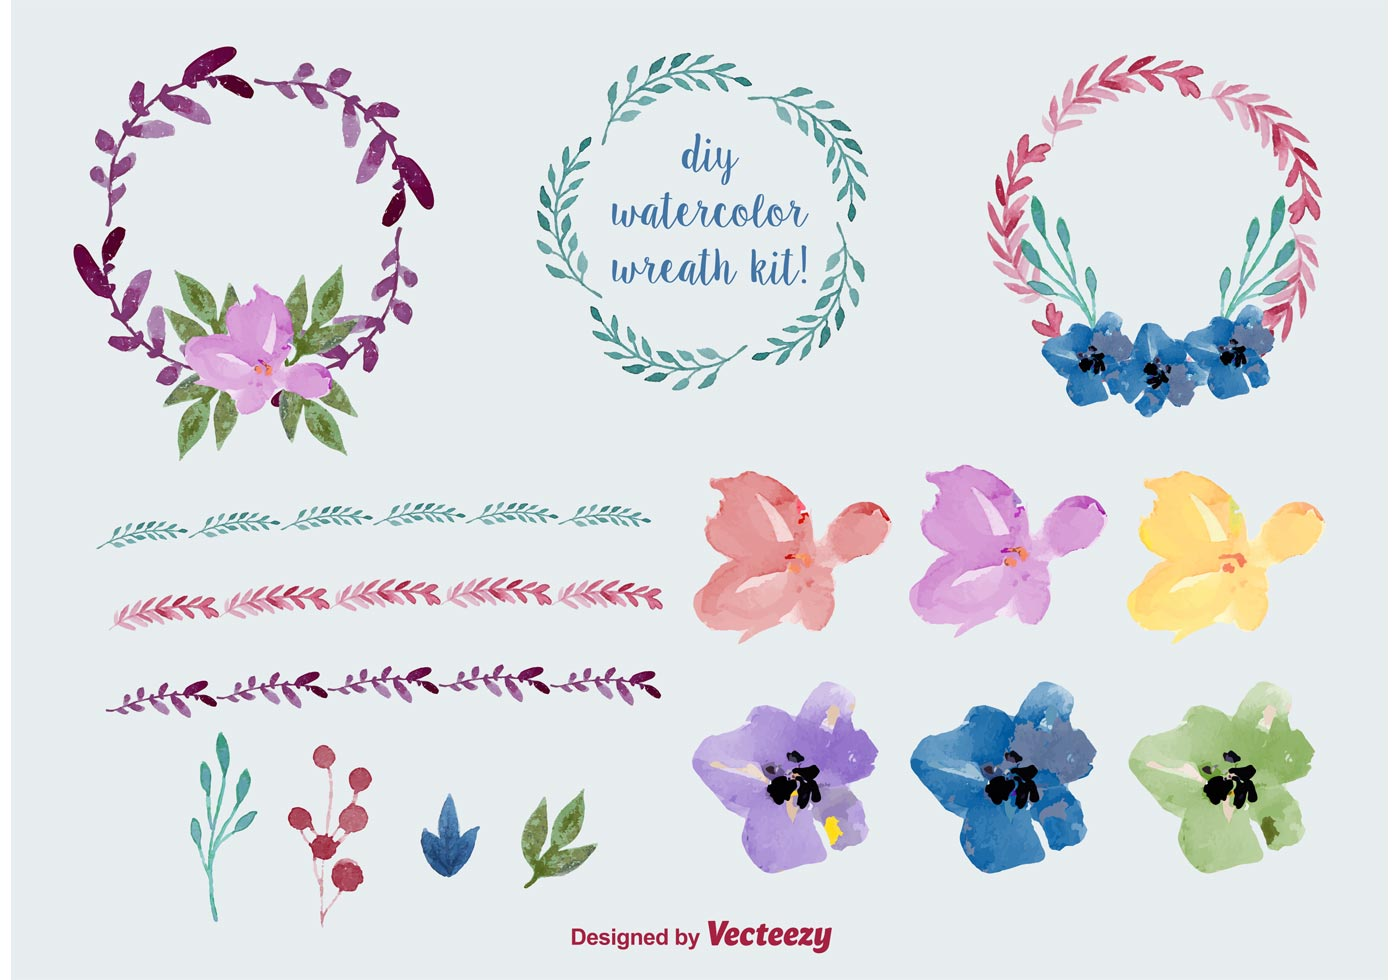 watercolor floral wreath vectors download free vector art stock